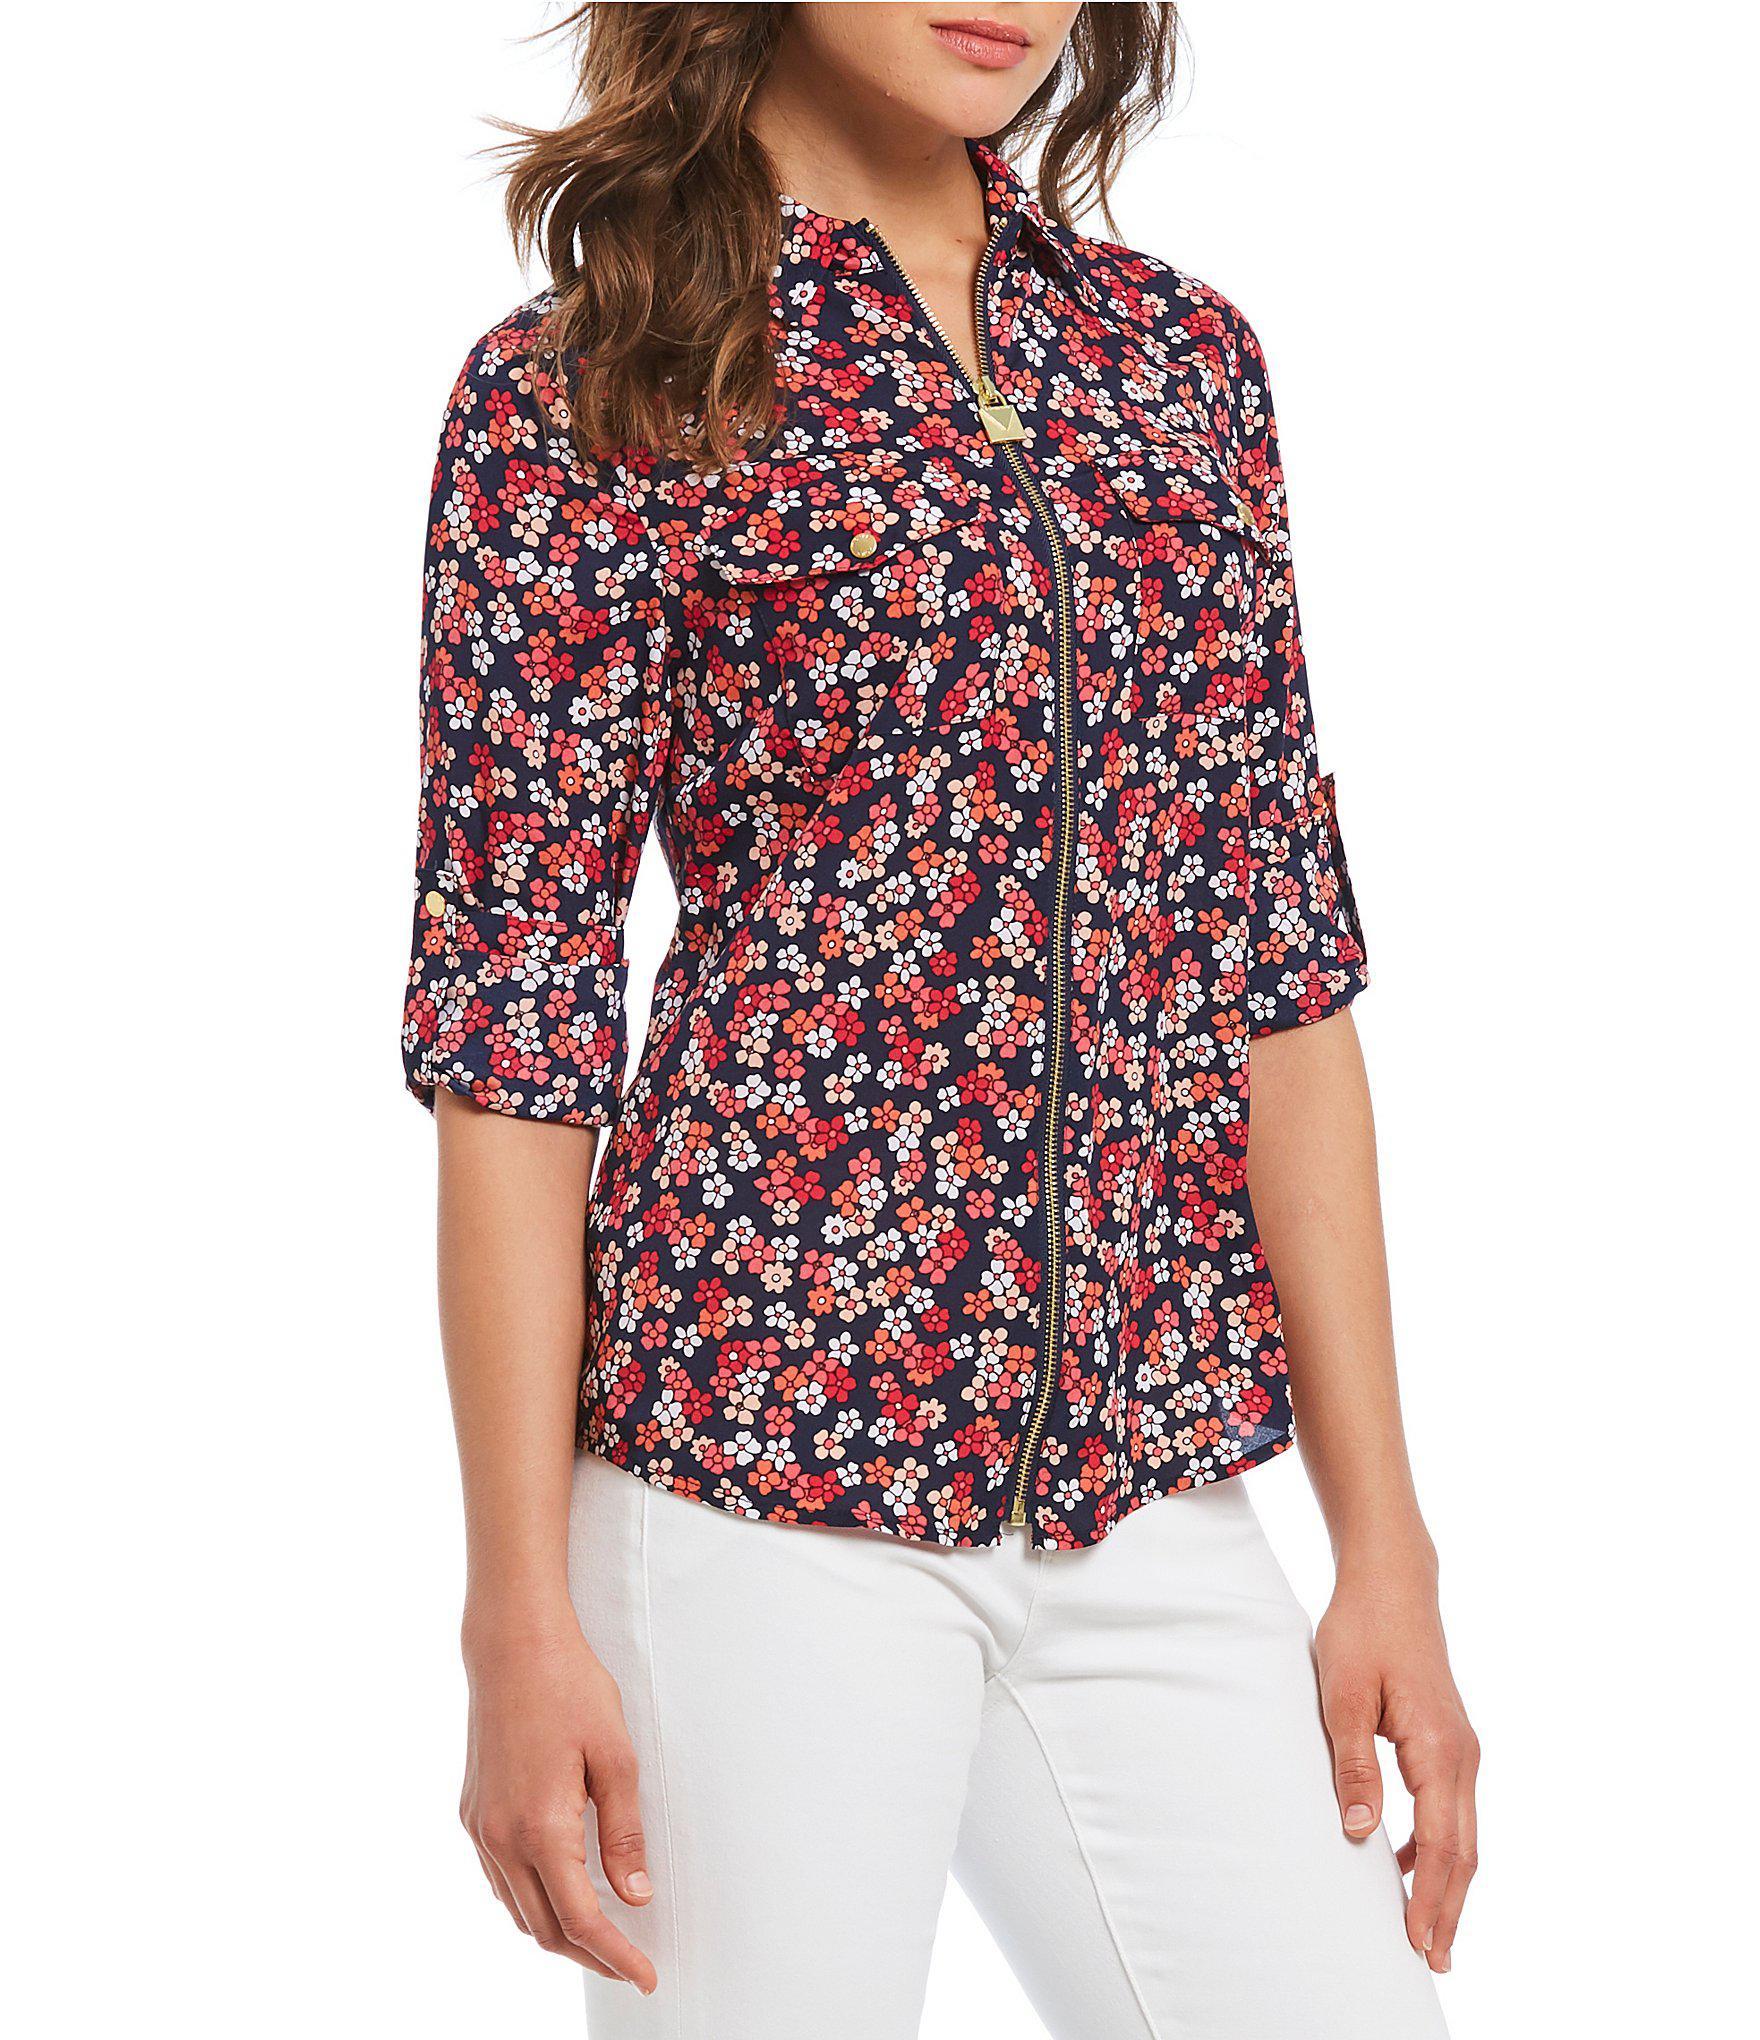 5c278febd88 Lyst - MICHAEL Michael Kors Cherry Blossoms Floral Print Roll-sleeve ...